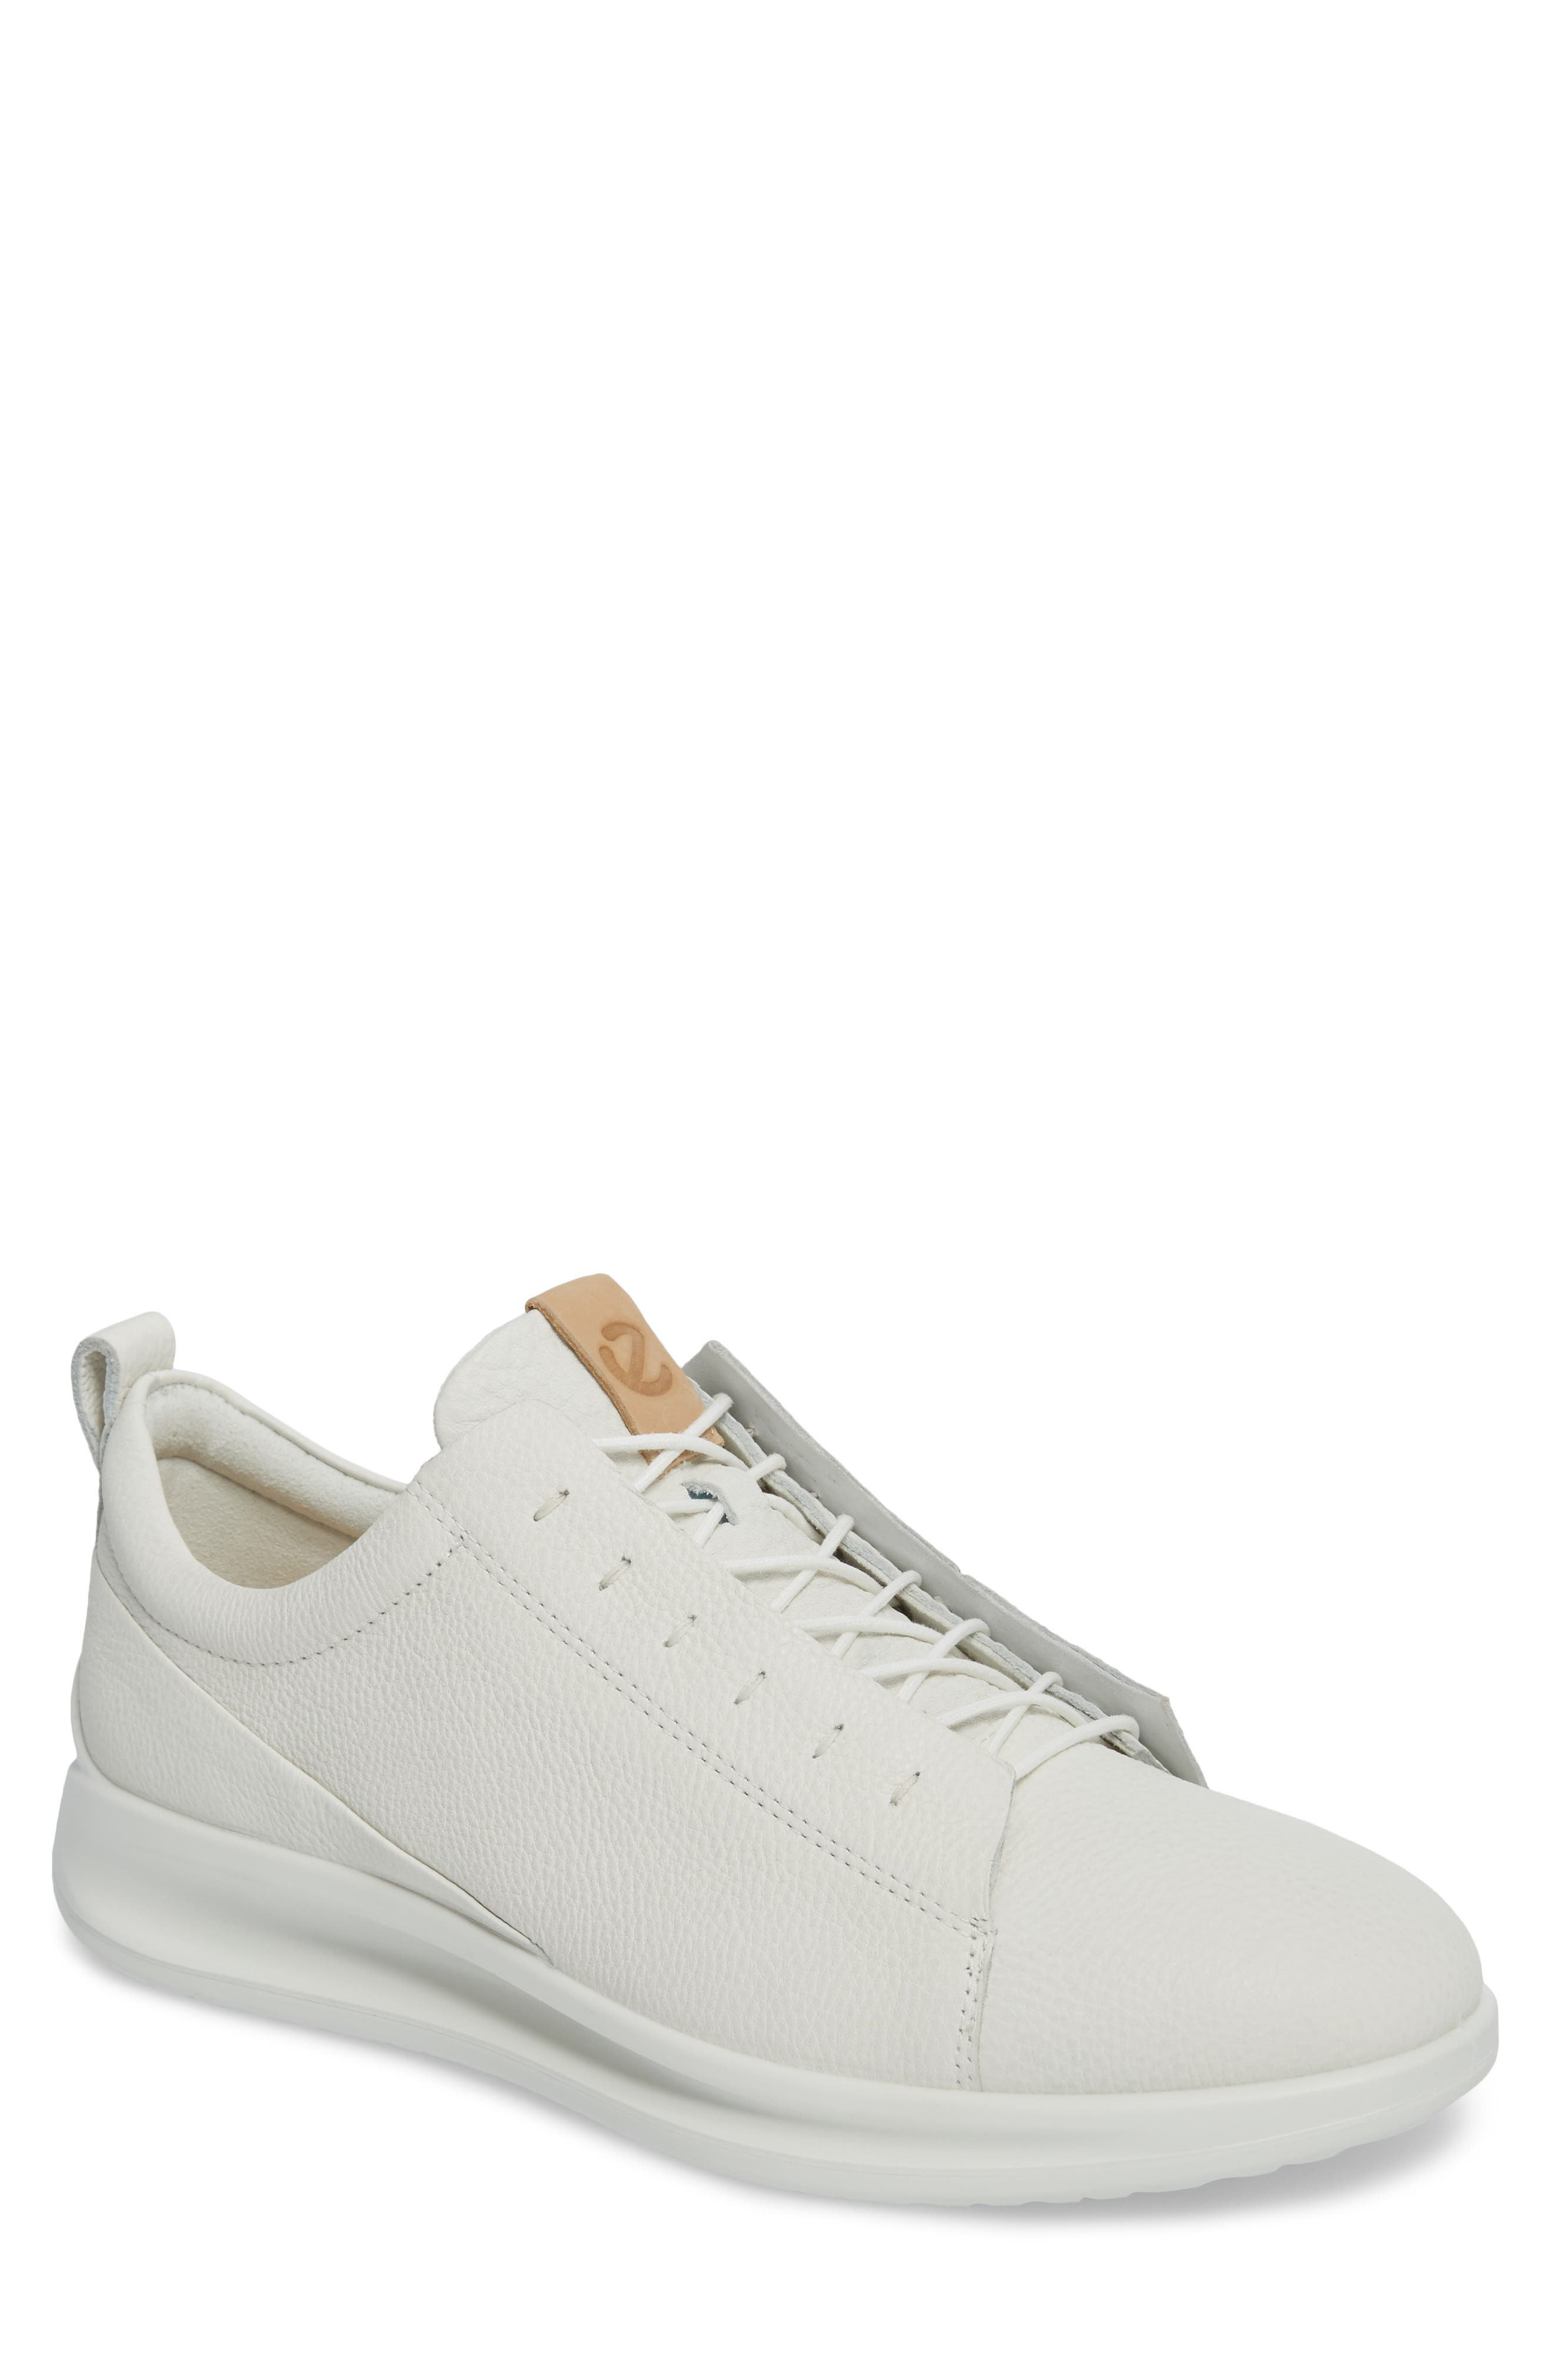 Aquet Low Top Sneaker,                             Main thumbnail 1, color,                             White Leather